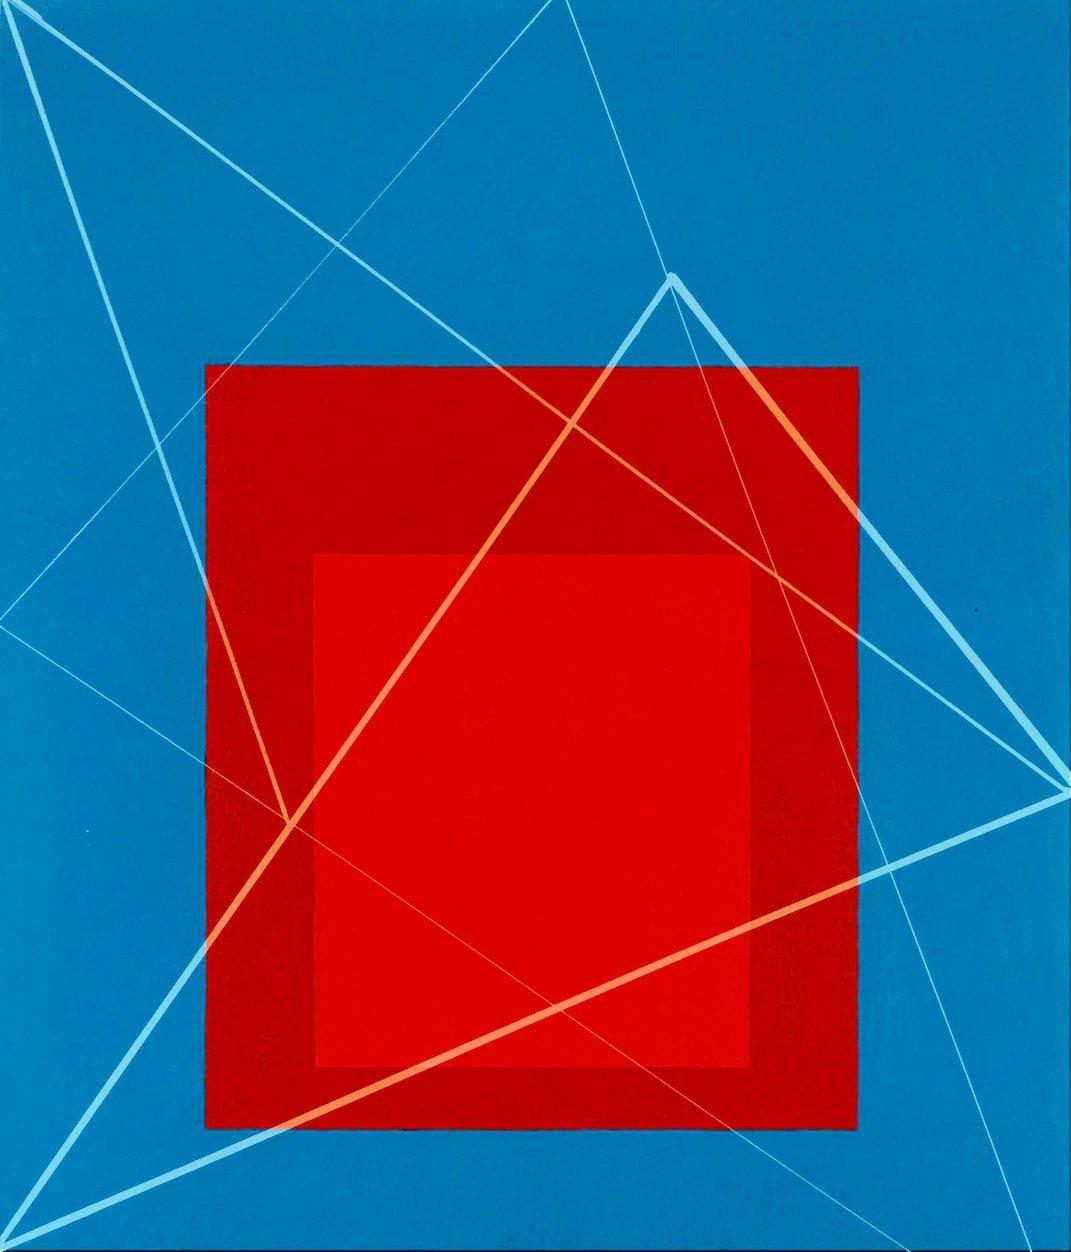 IMG_5361 merge AHS red blue.JPG